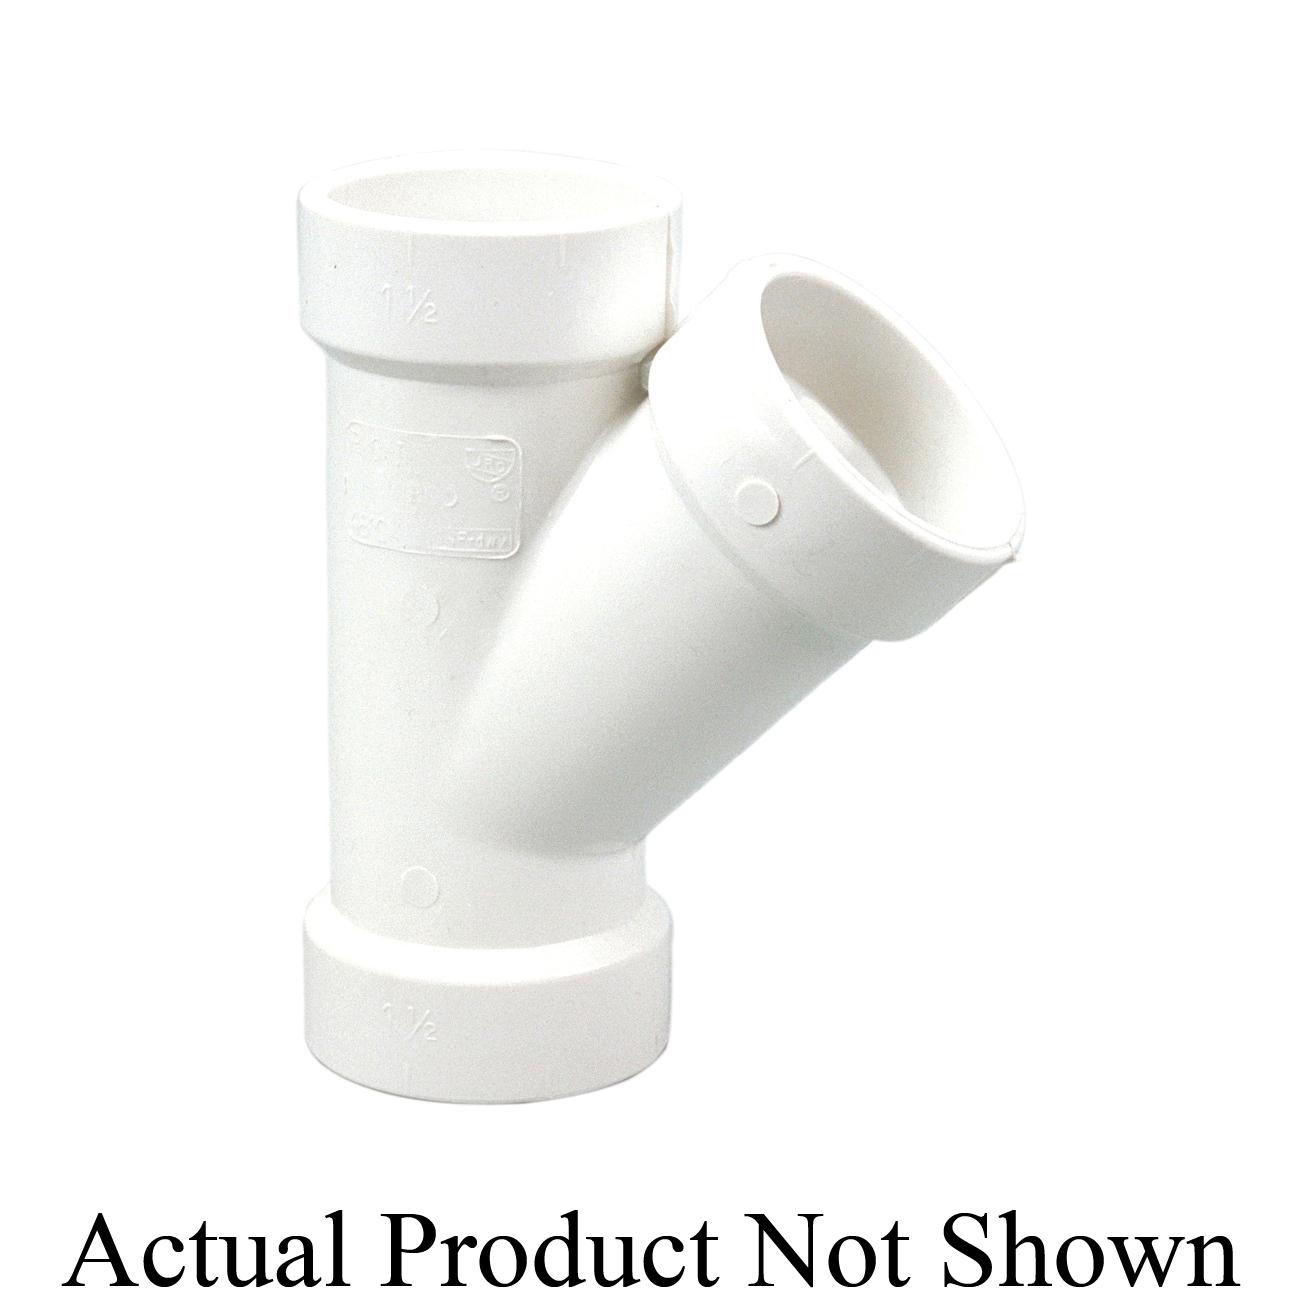 NIBCO® K090300 4810-R DWV Reducing Wye, 2 x 2 x 1-1/2 in Nominal, Hub End Style, PVC, Domestic